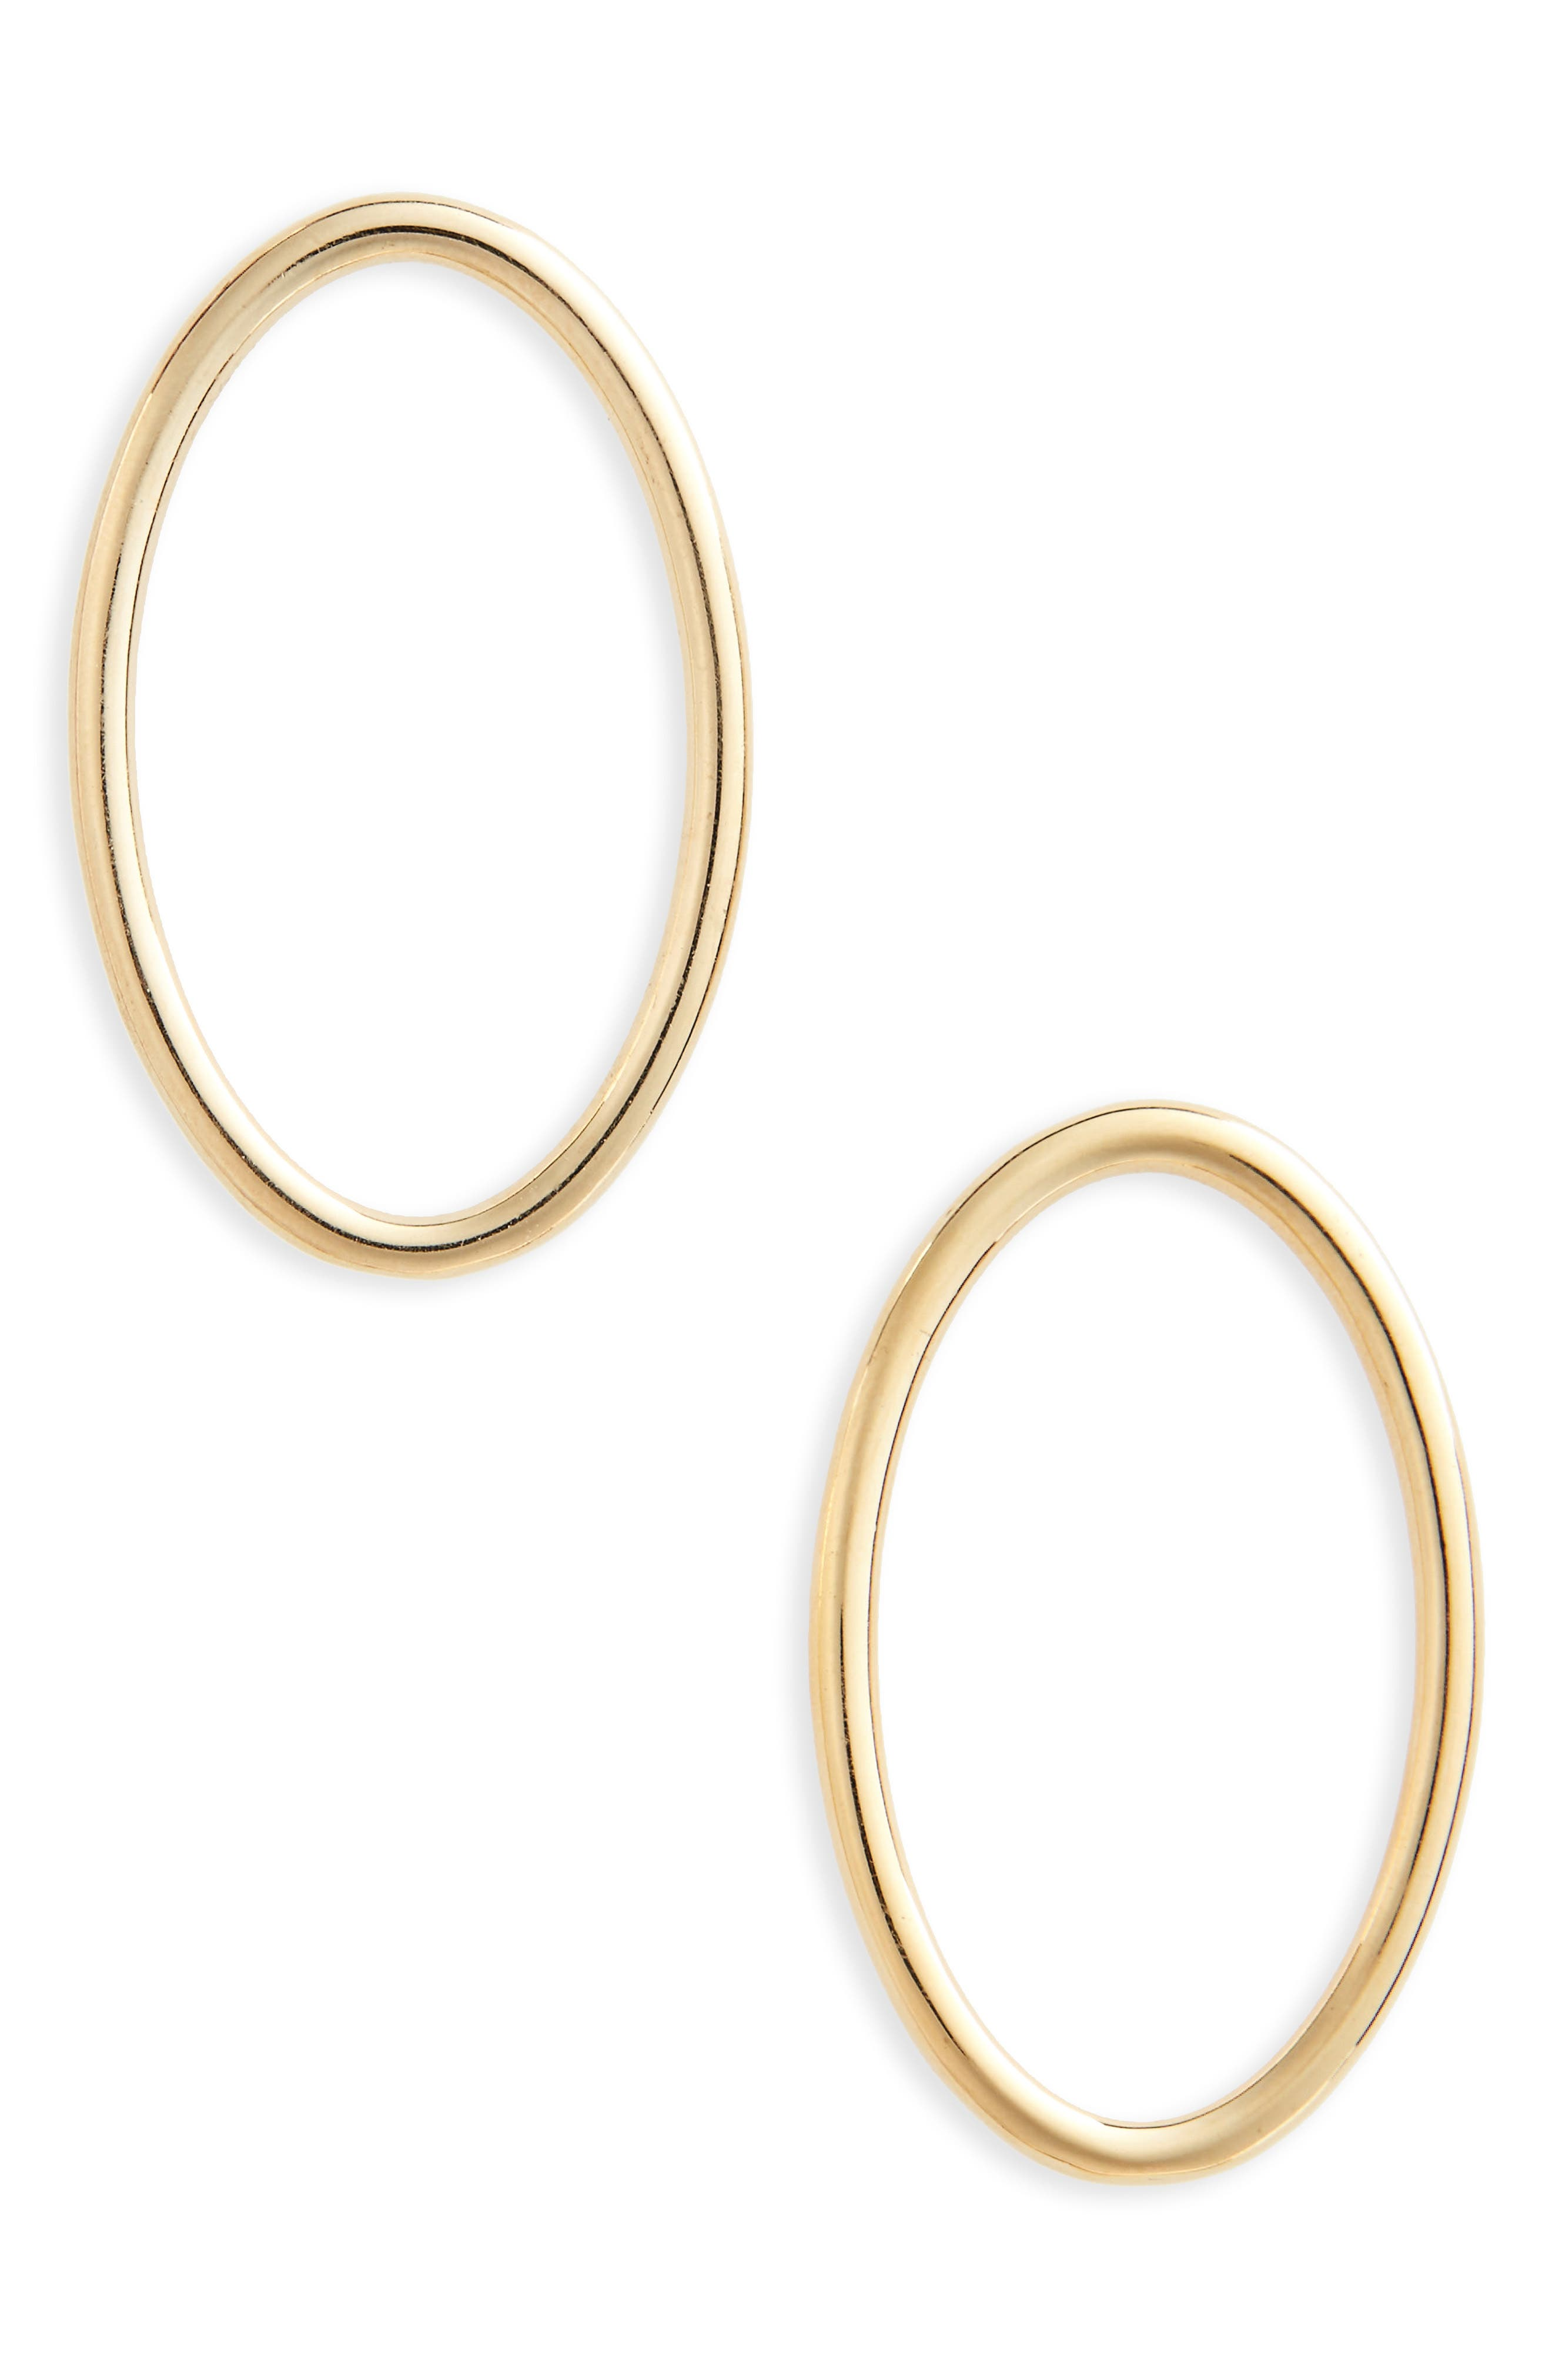 Main Image - All Blues Large Ellipse Polished Vermeil Earrings